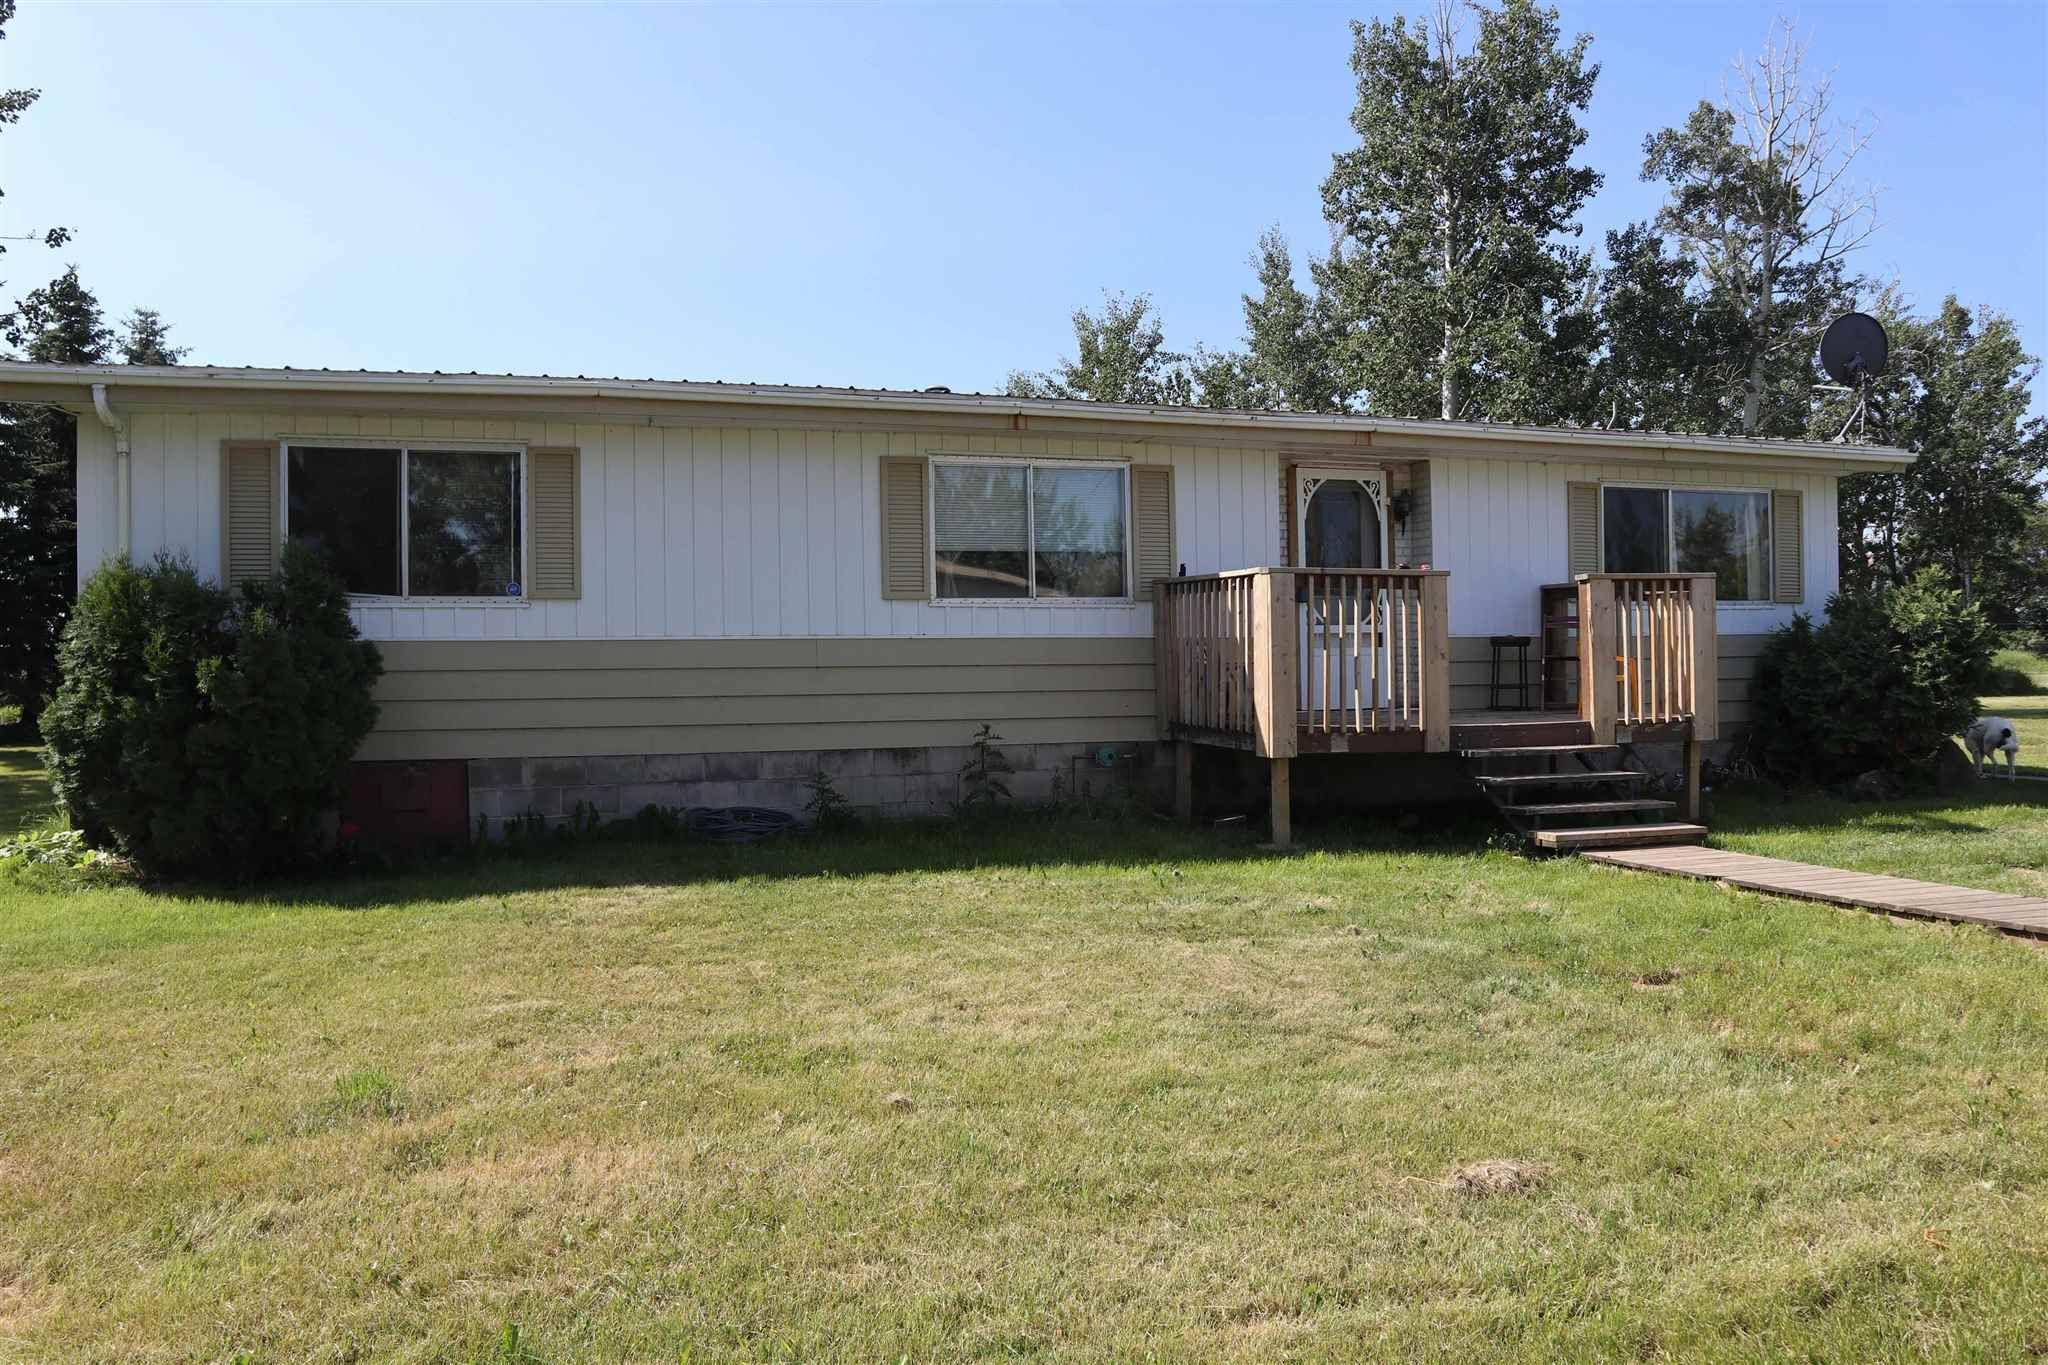 Main Photo: 3075 Twp 485: Rural Leduc County House for sale : MLS®# E4253370